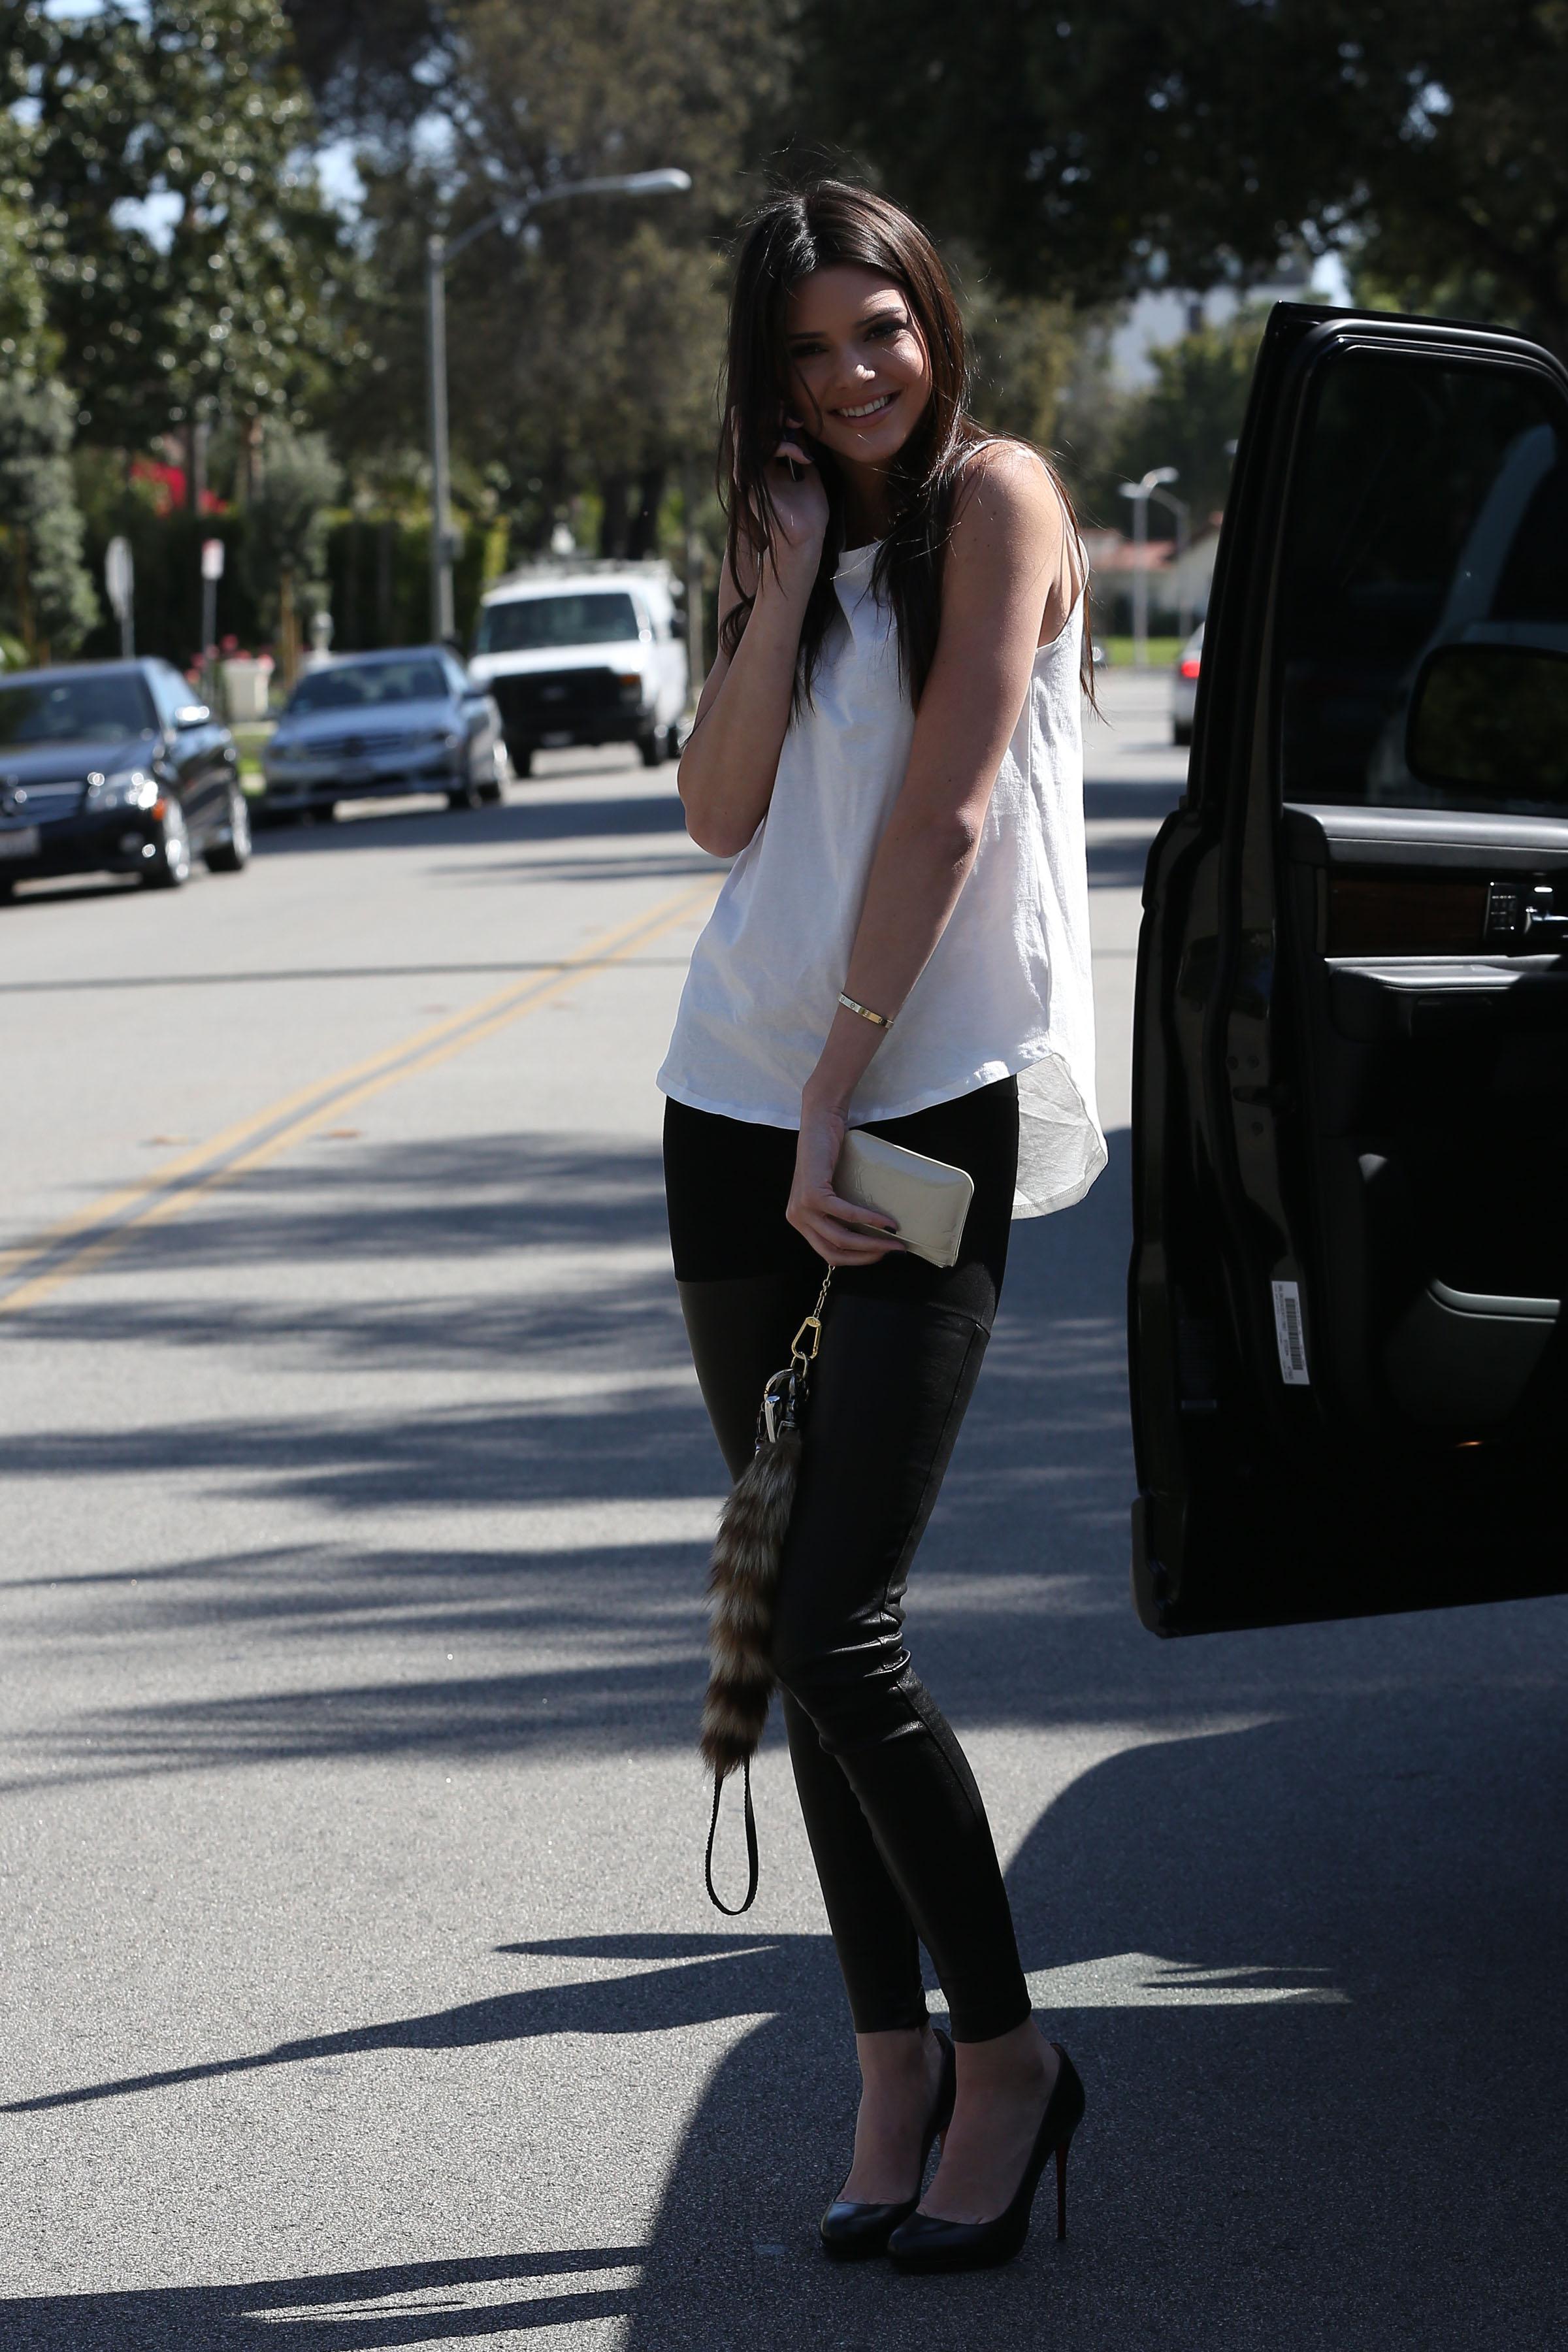 42325_Kendall_Jenner_LosAngelesApril112013_J0001_002_122_58lo.jpg